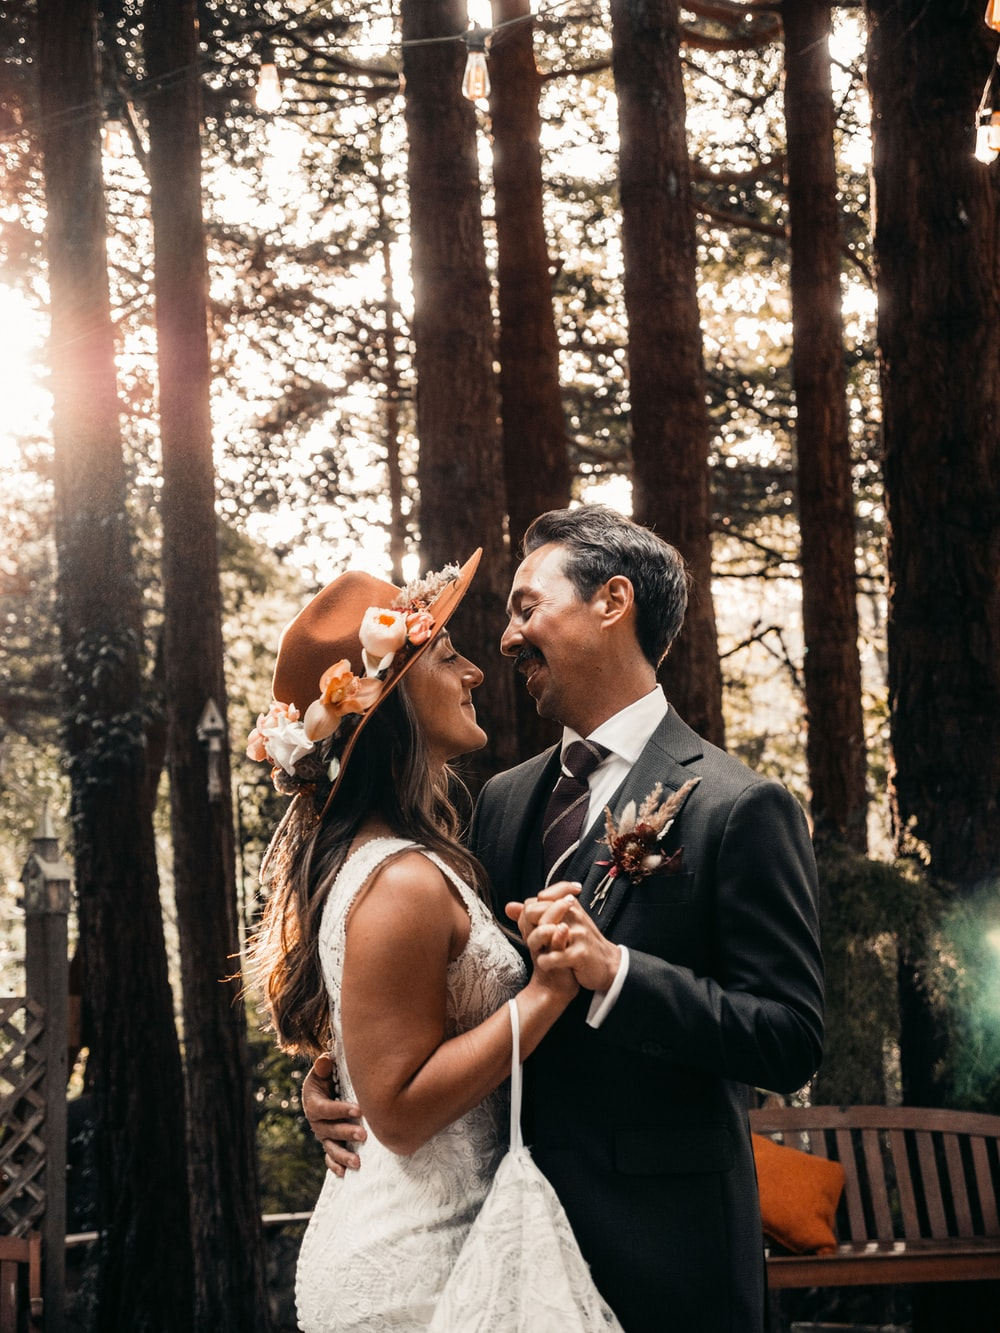 man in black suit jacket kissing woman in white sleeveless dress